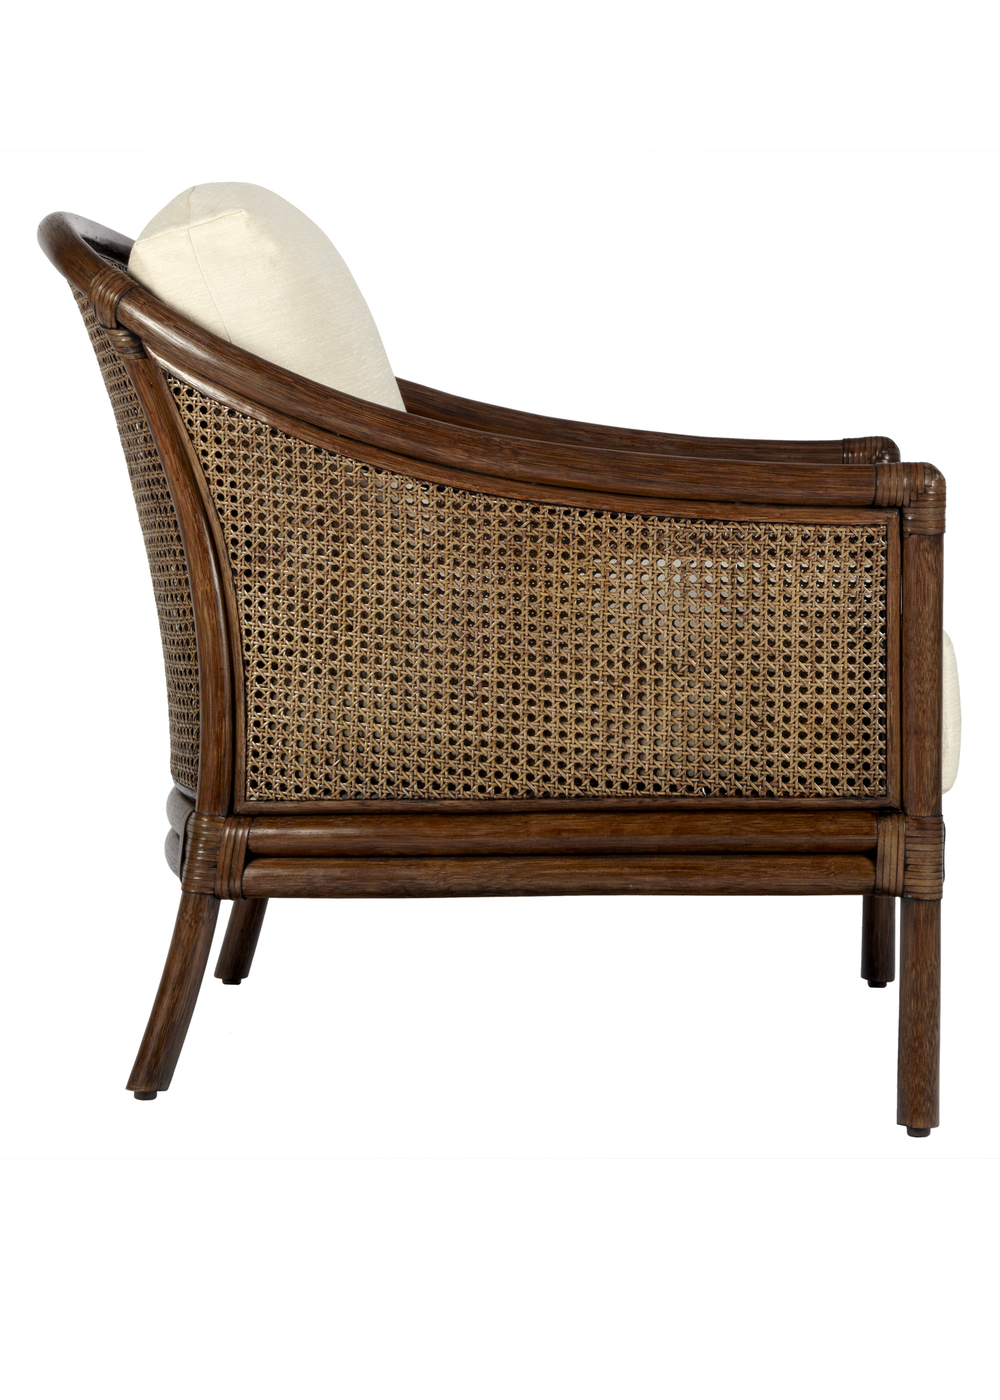 Selamat Designs - Tivoli Lounge Chair